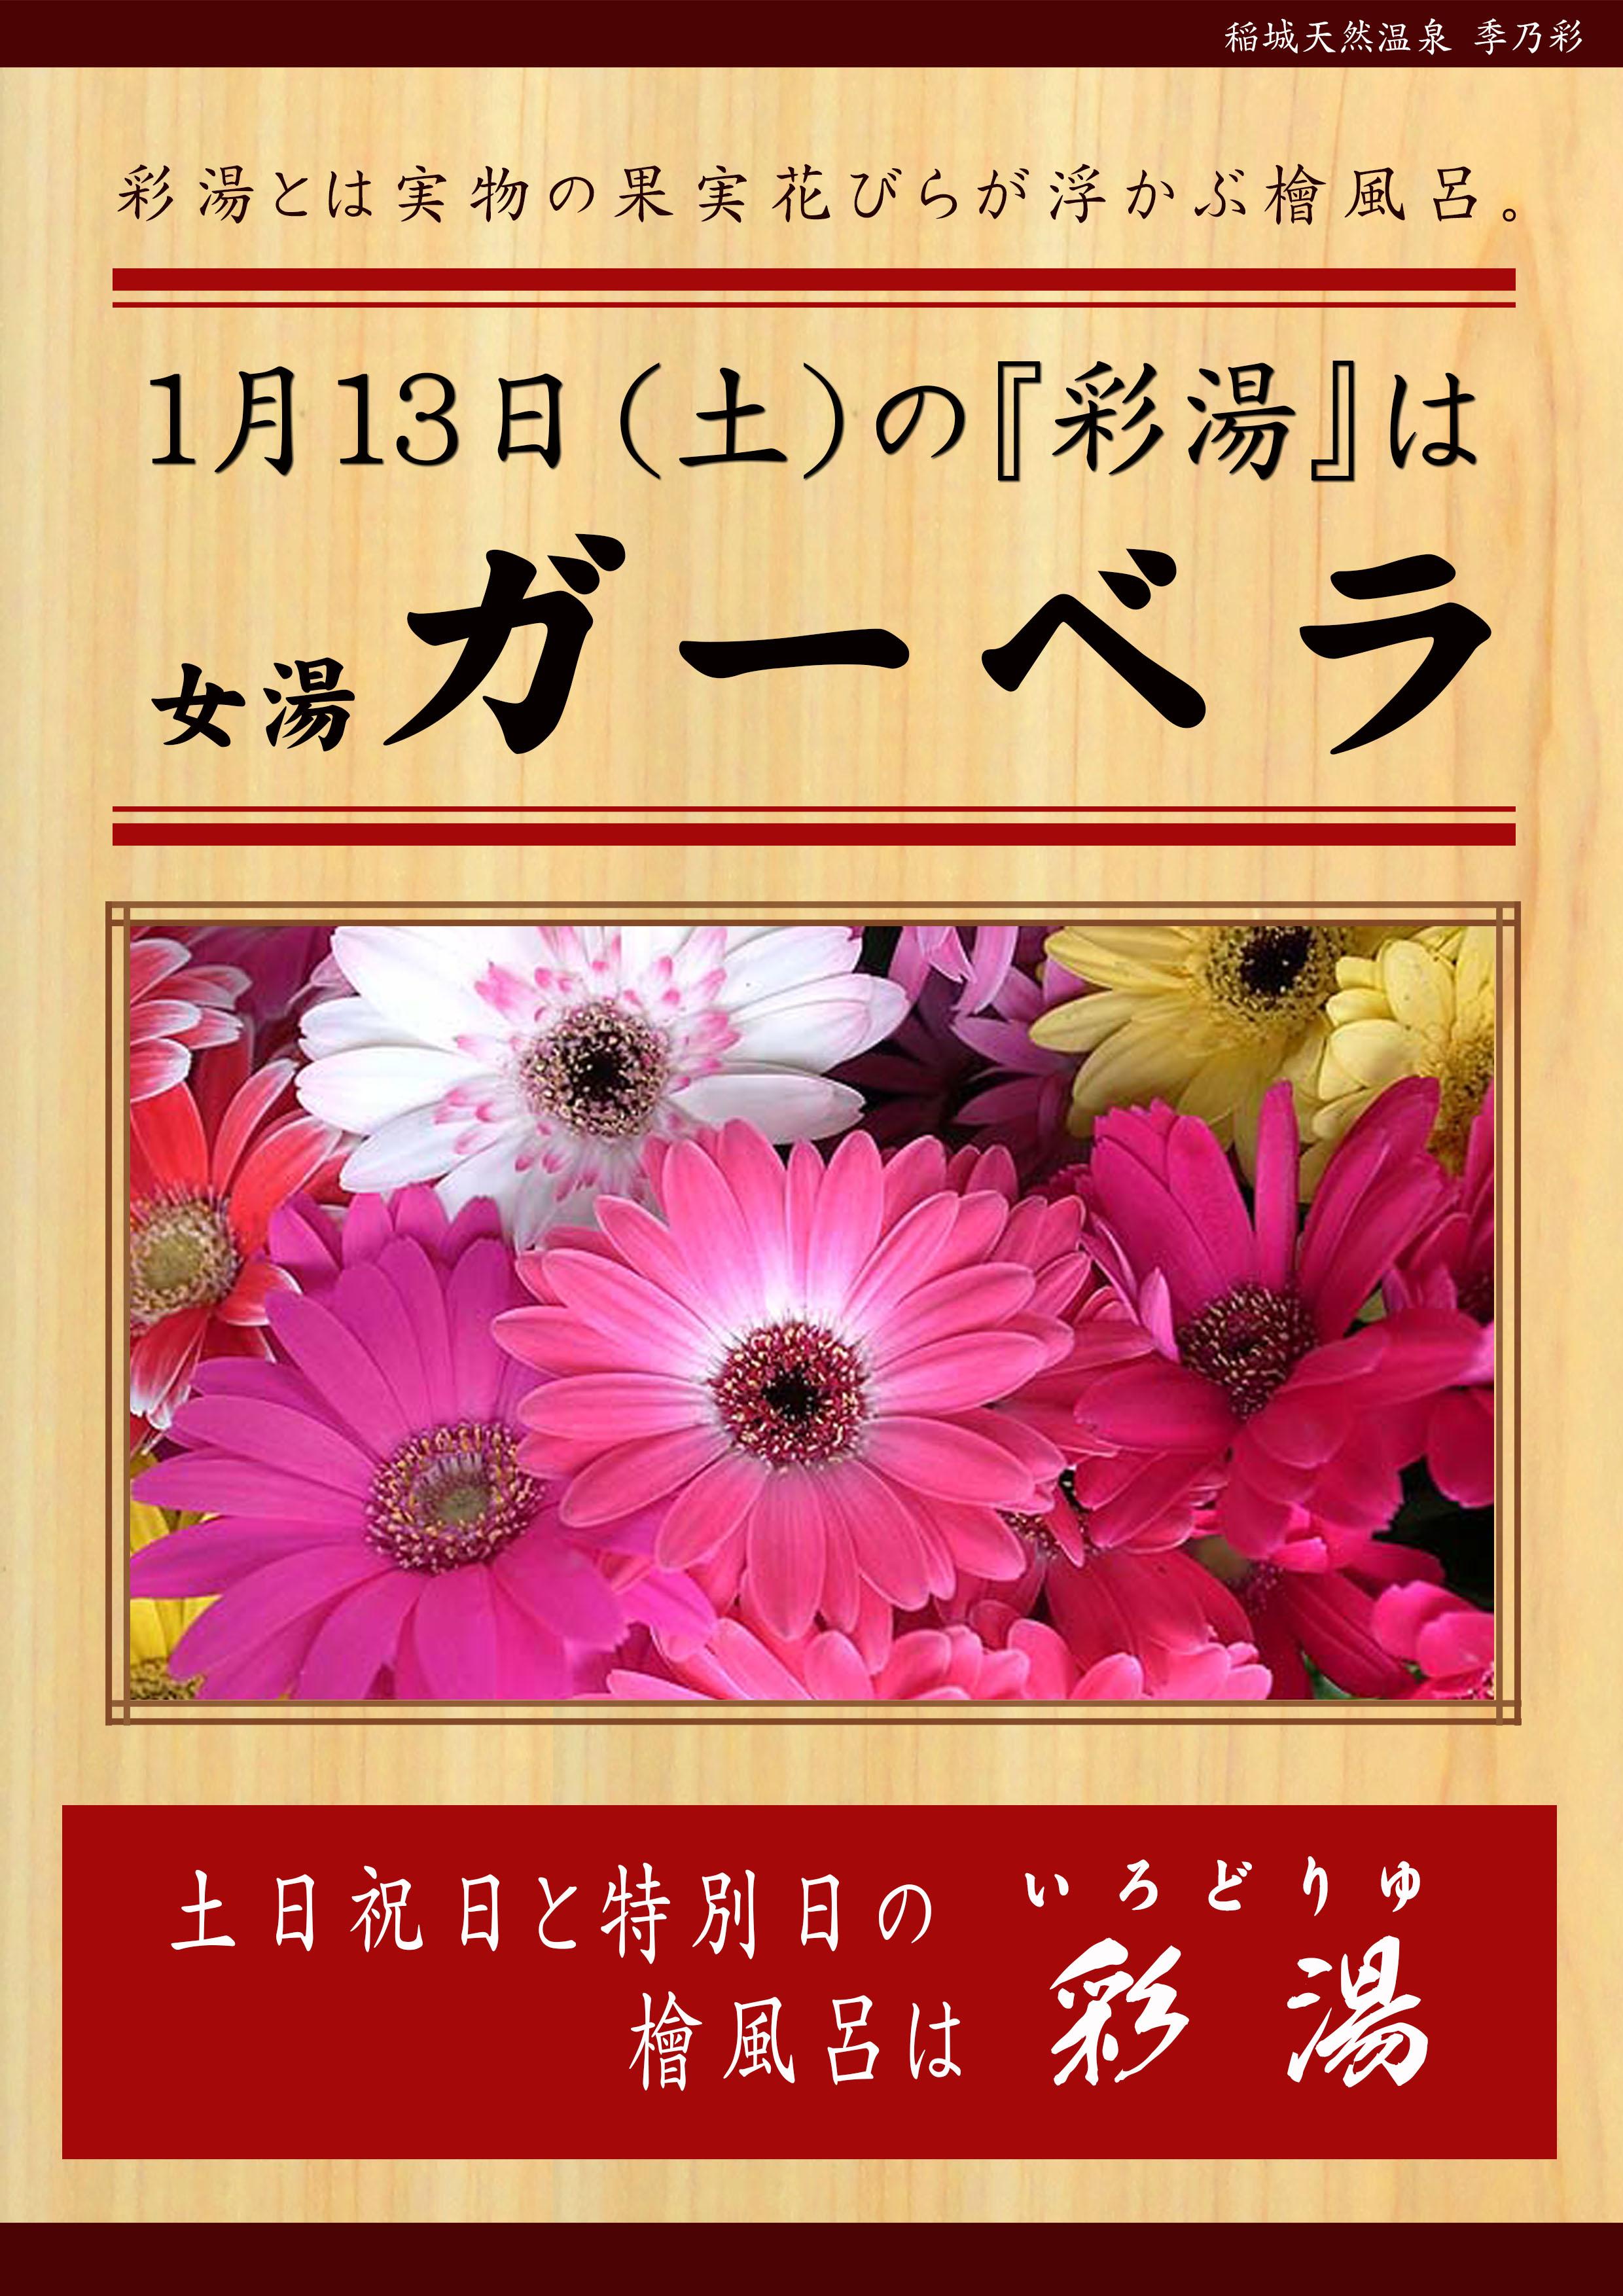 20180113POP イベント 彩湯 女湯 ガーベラ